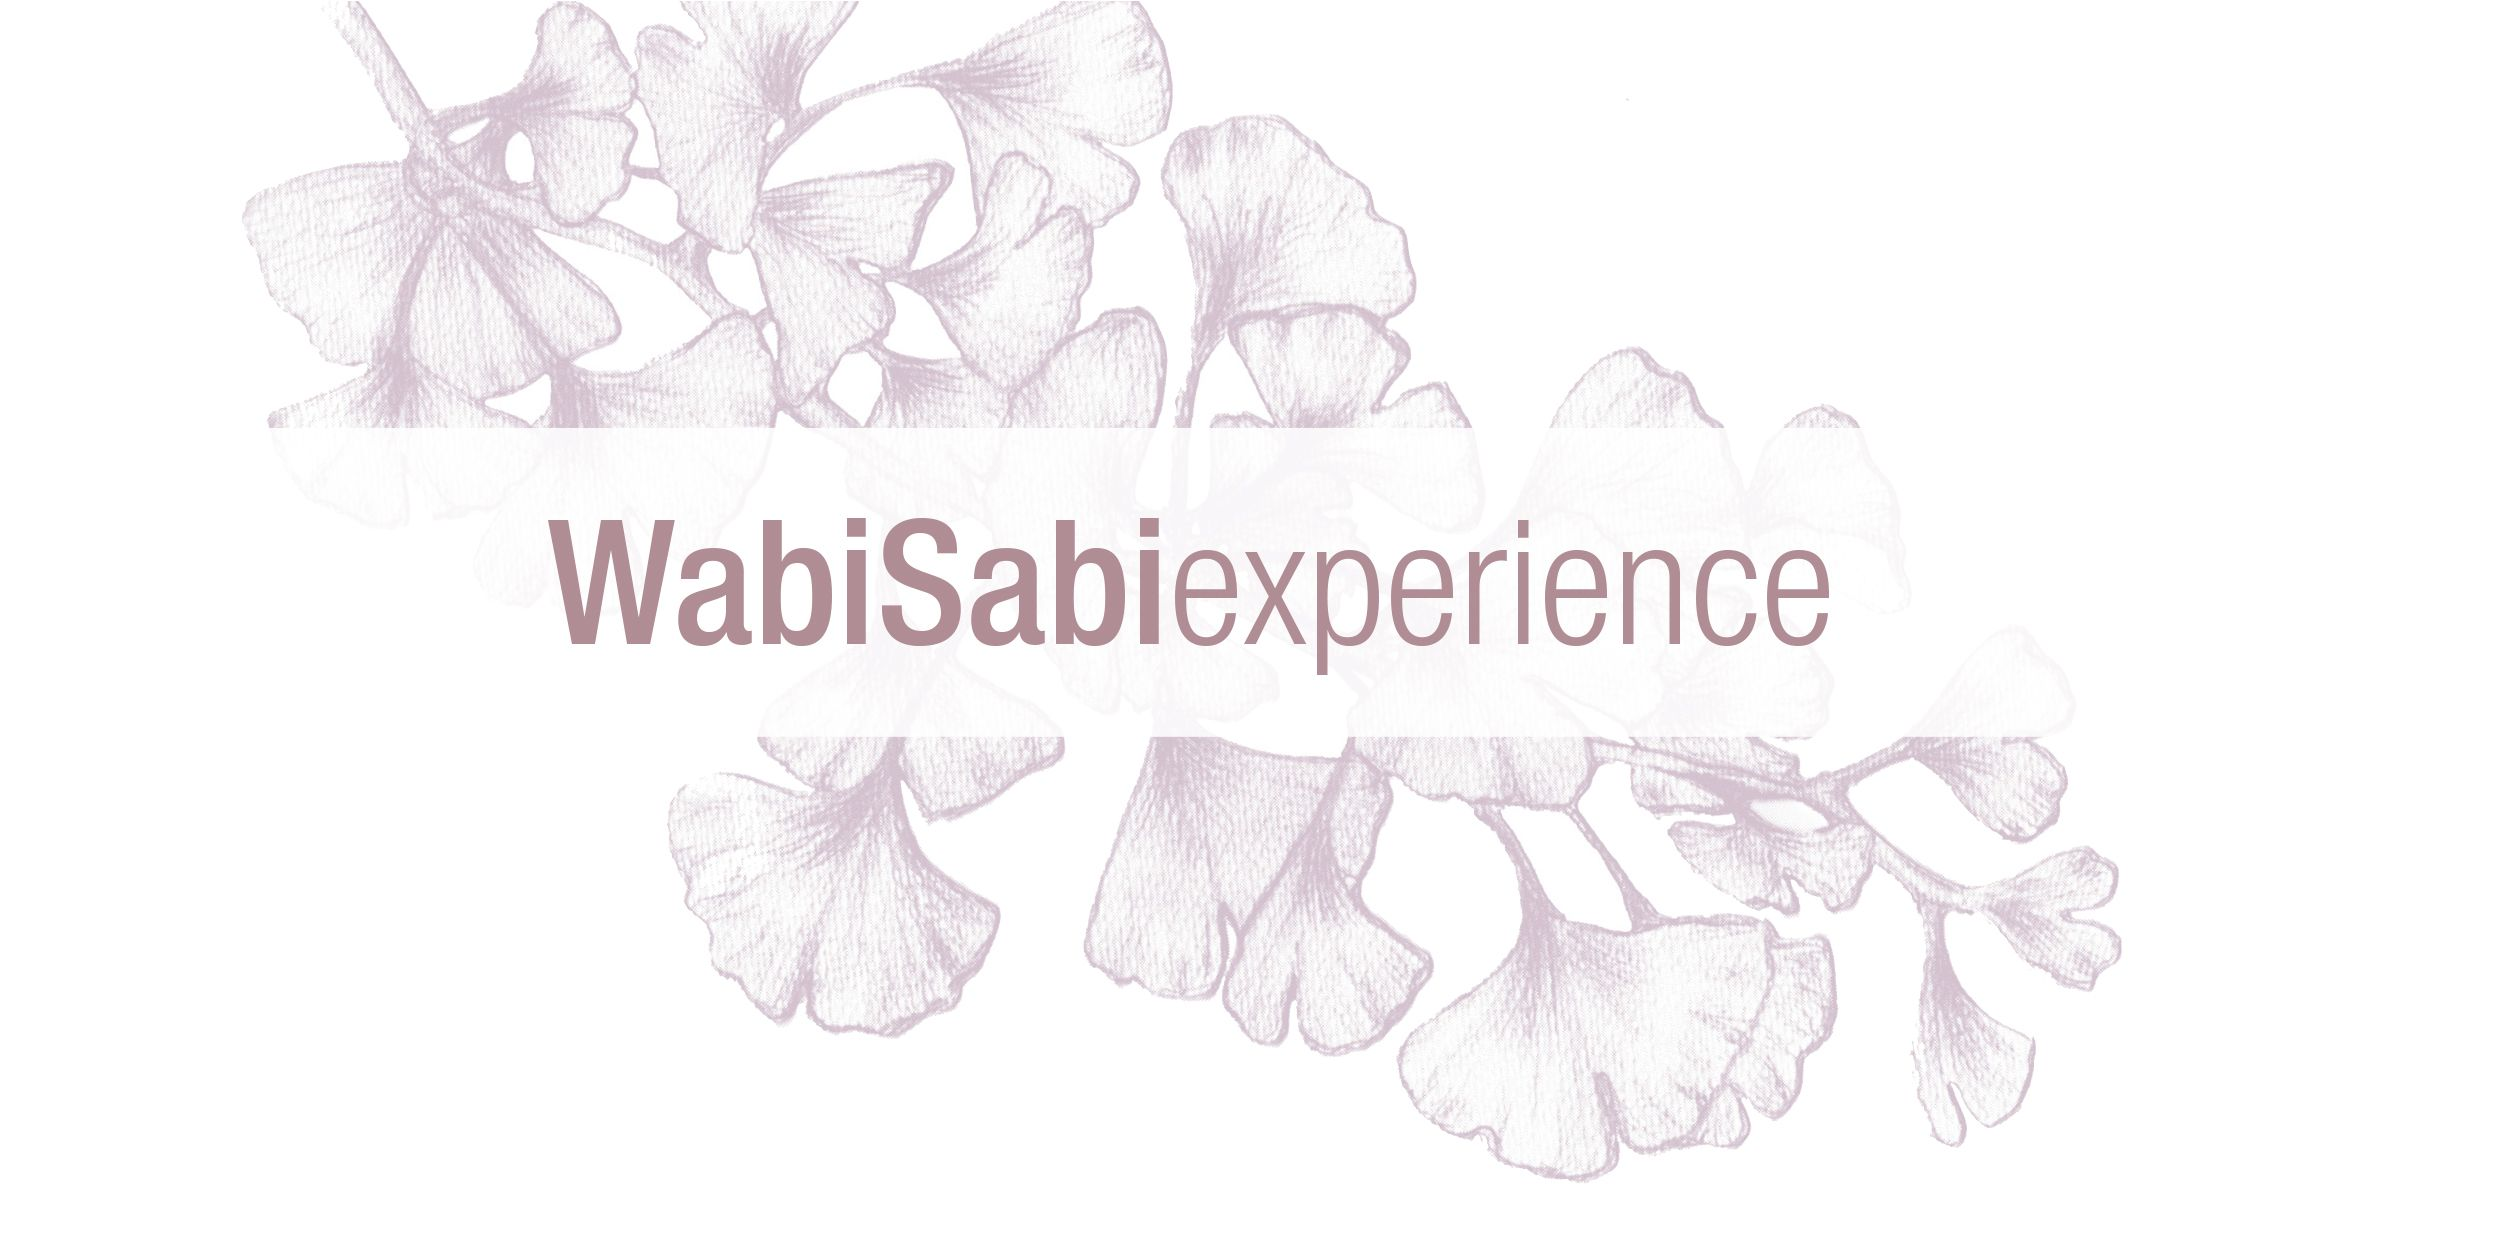 wabiSabi experience